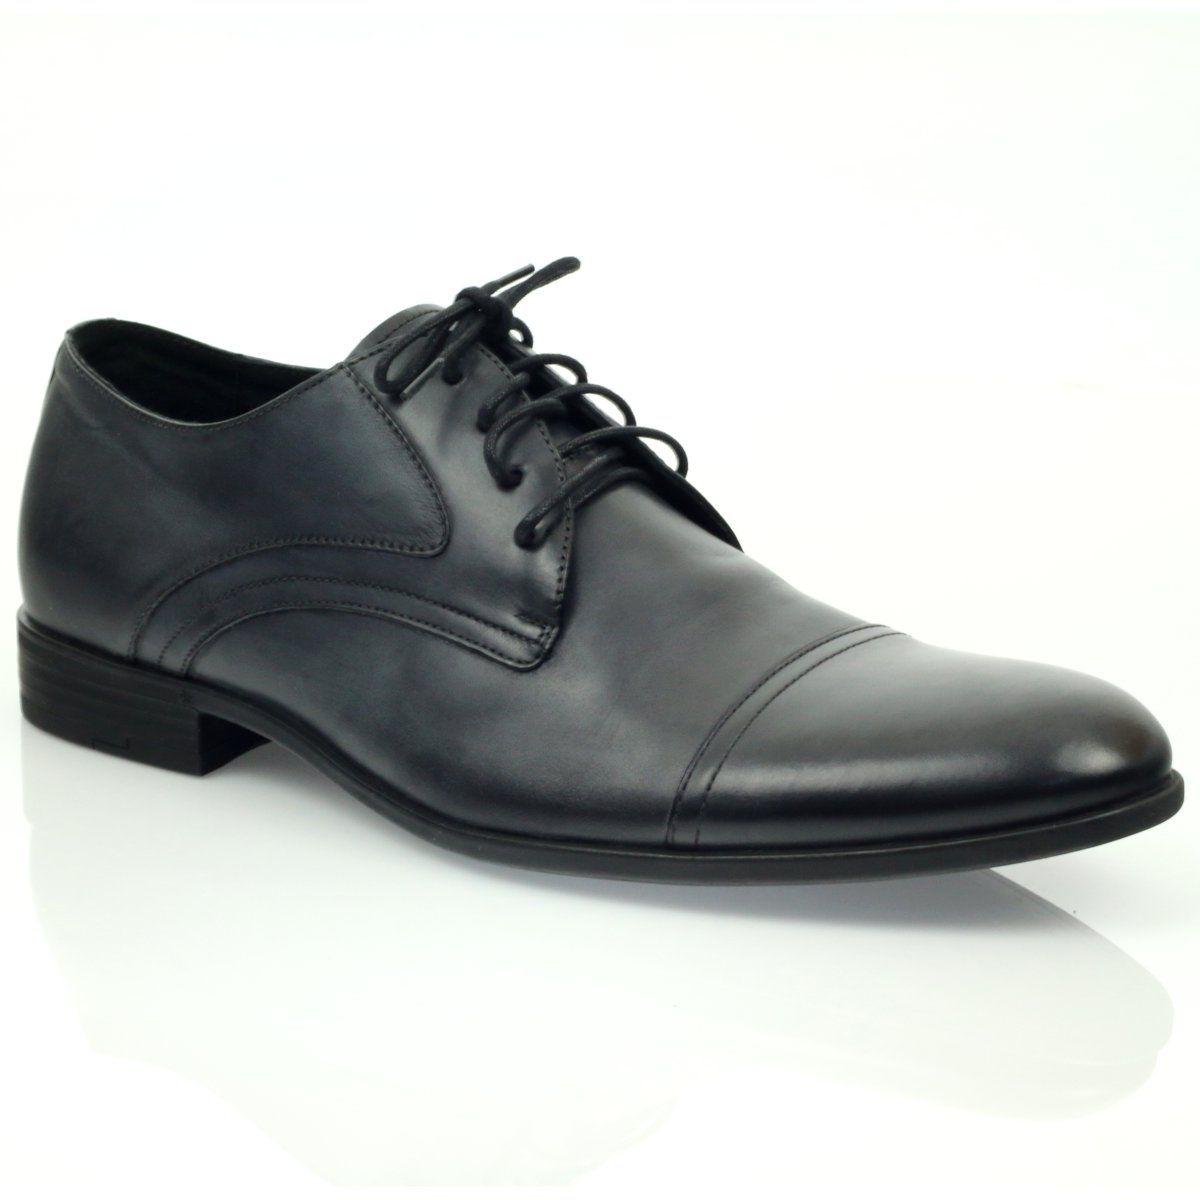 Polbuty Buty Meskie Skorzane Pilpol 1674 Szare Dress Shoes Men Dress Shoes Oxford Shoes